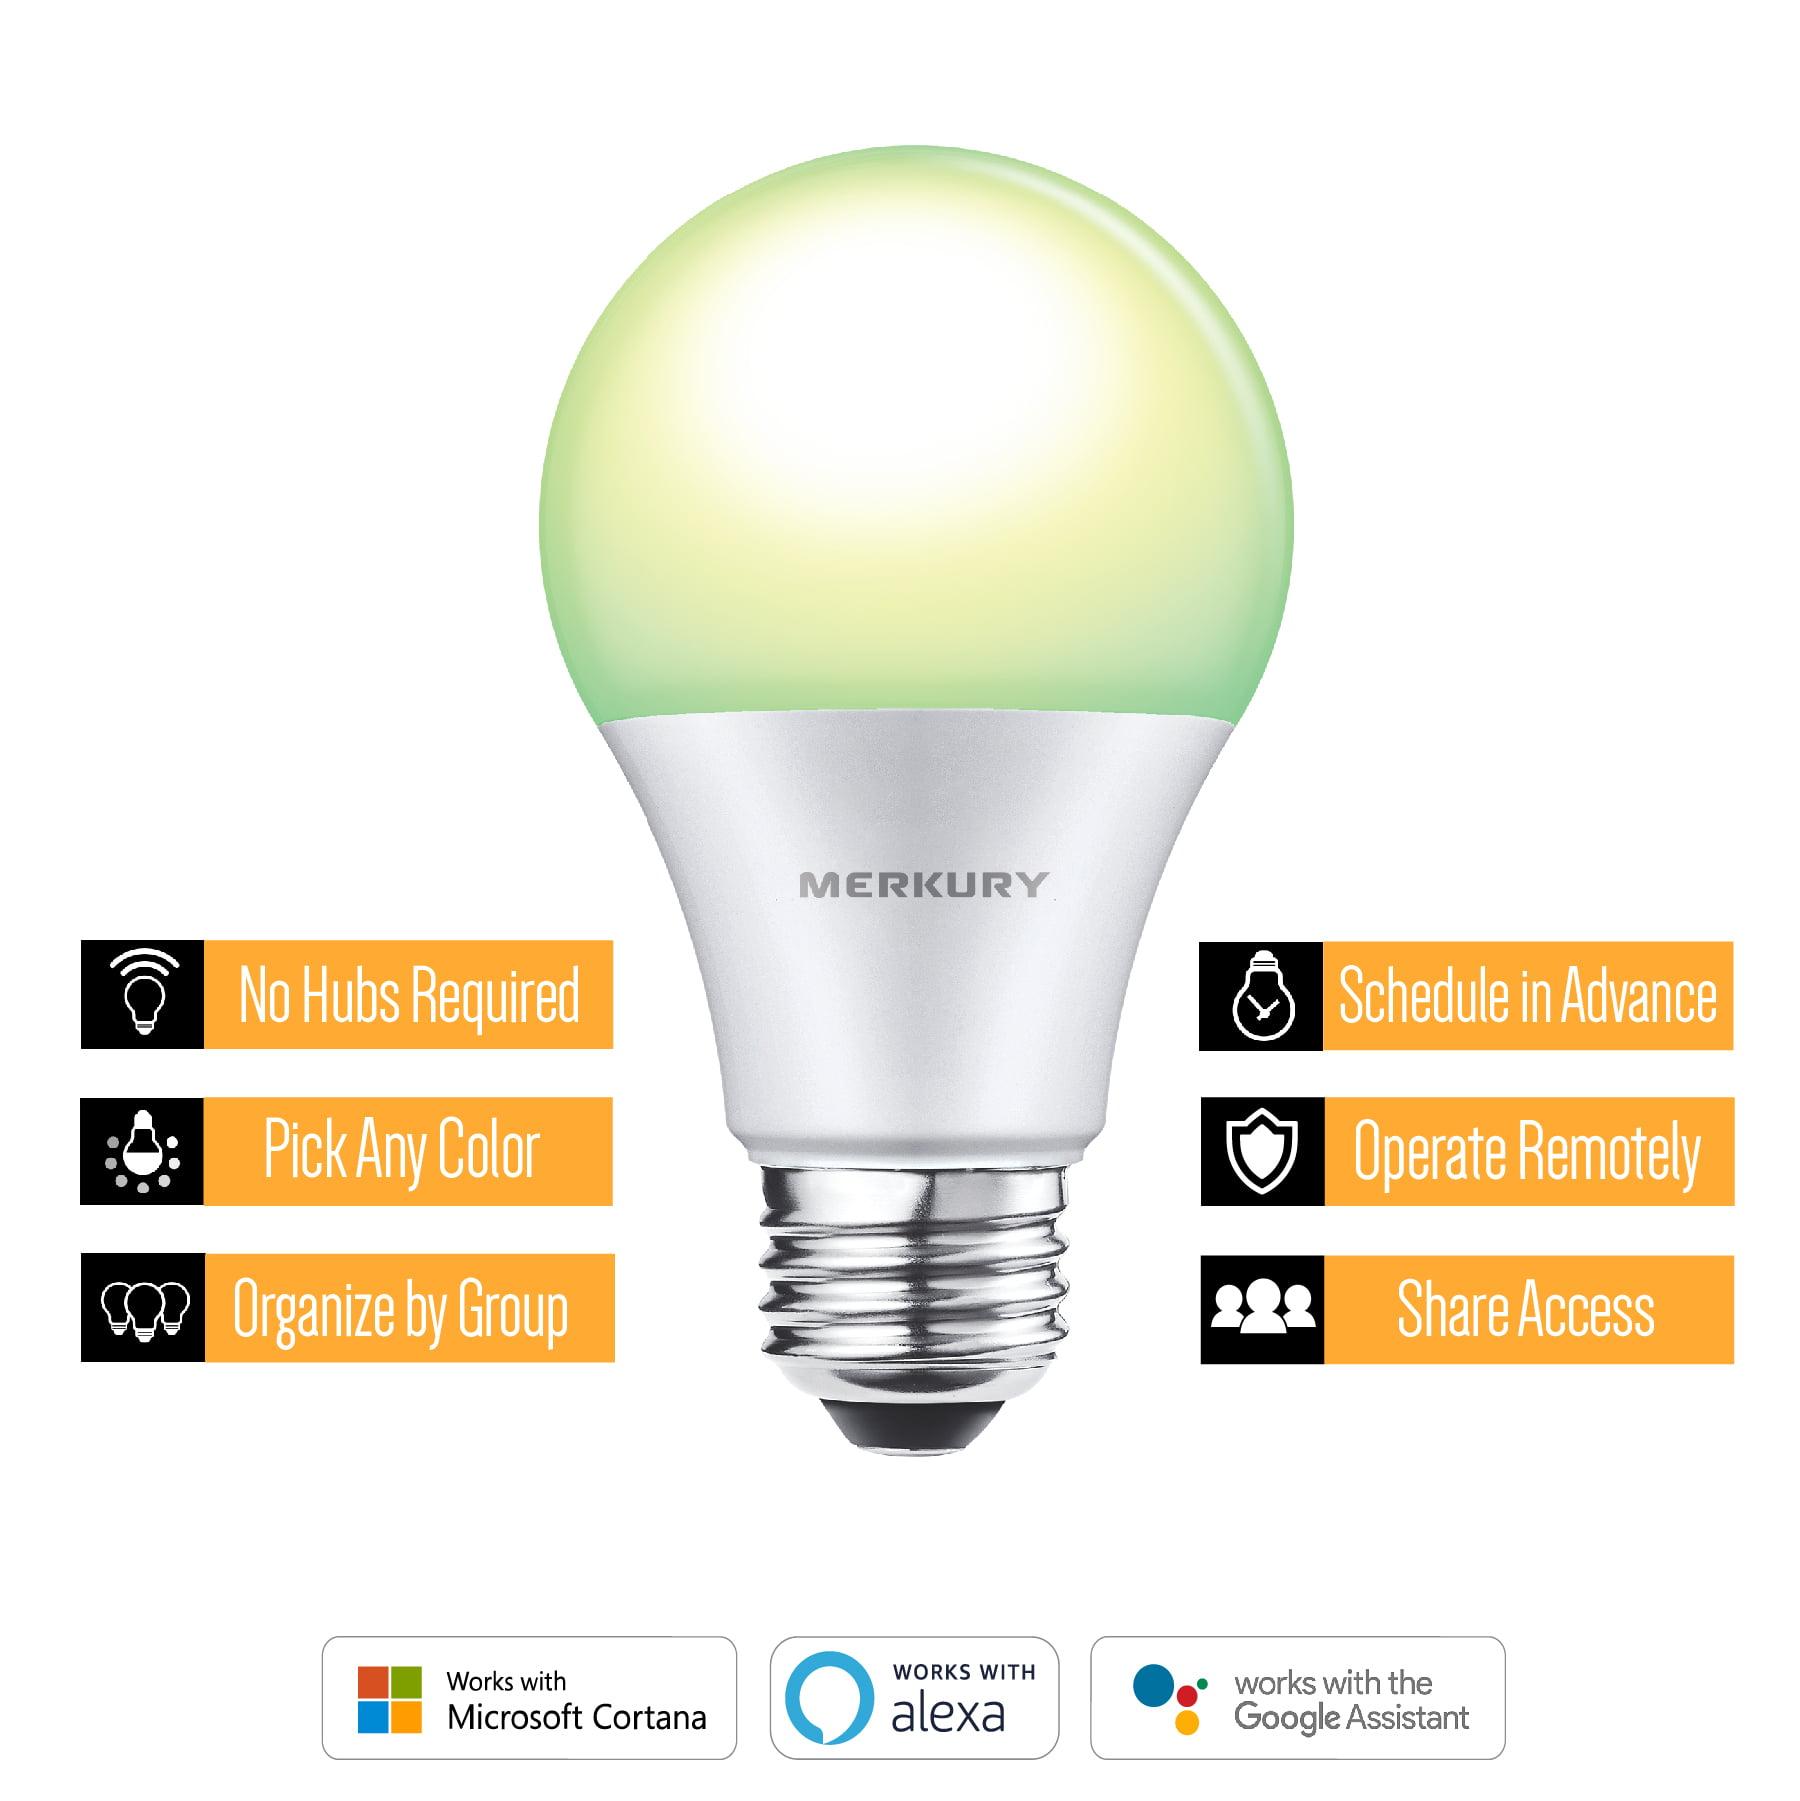 Merkury Innovations A21 Smart Light Bulb, 75W Color LED, 1-Pack